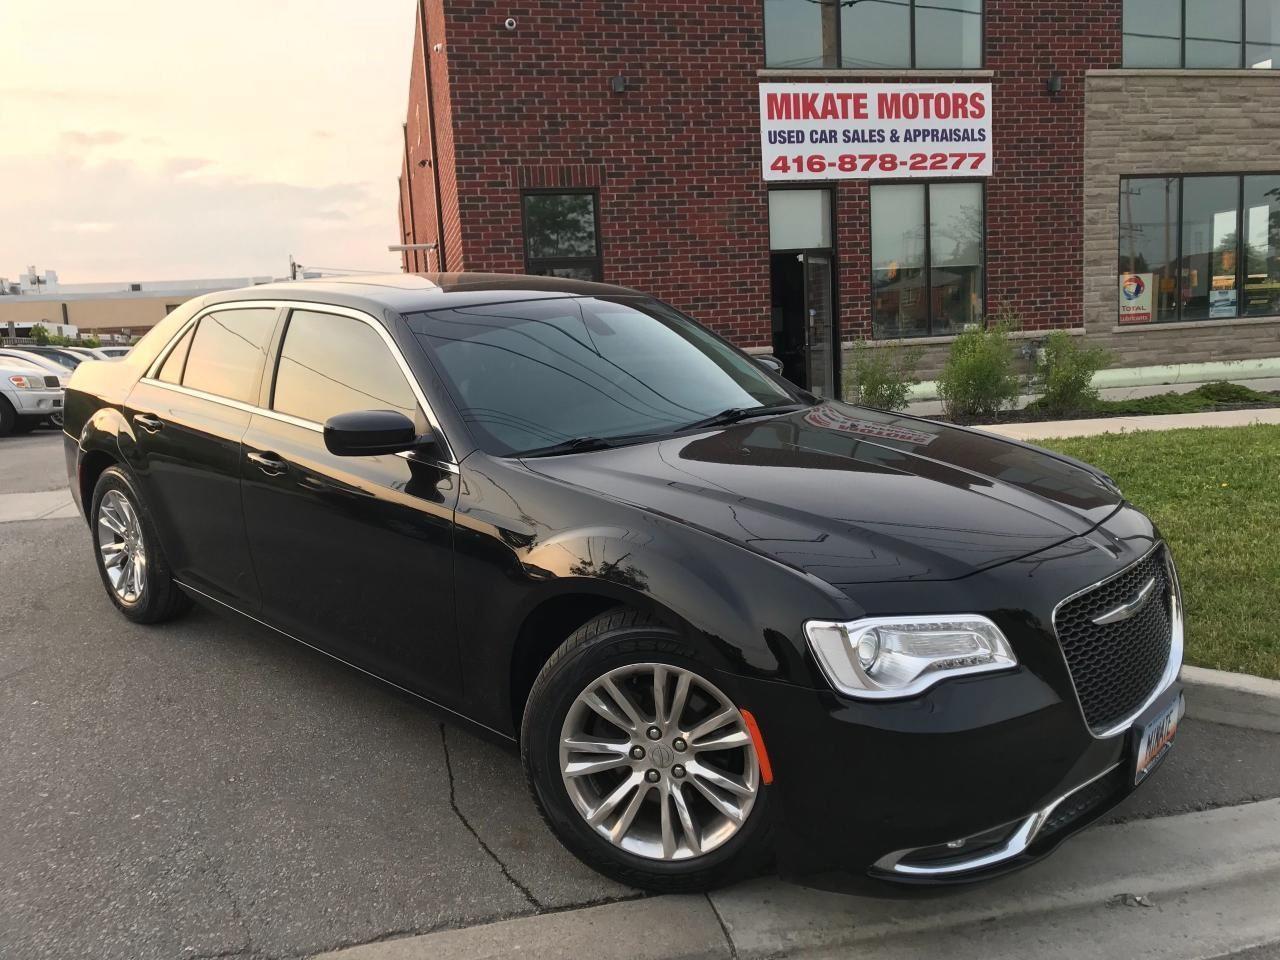 2015 Chrysler 300 Touring